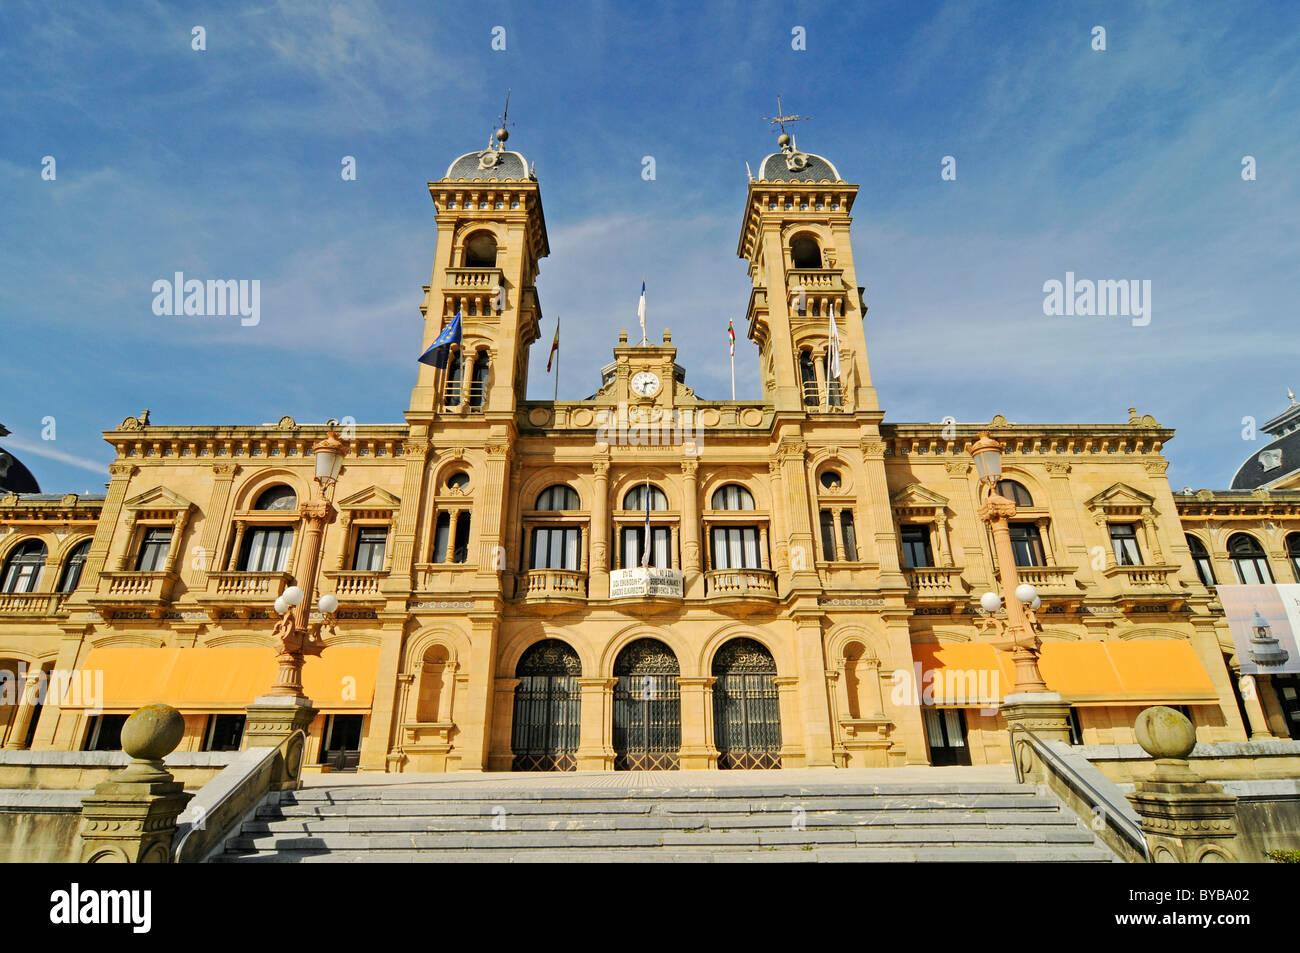 City Hall, San Sebastian, Pais Vasco, Basque Country, Spain, Europe - Stock Image